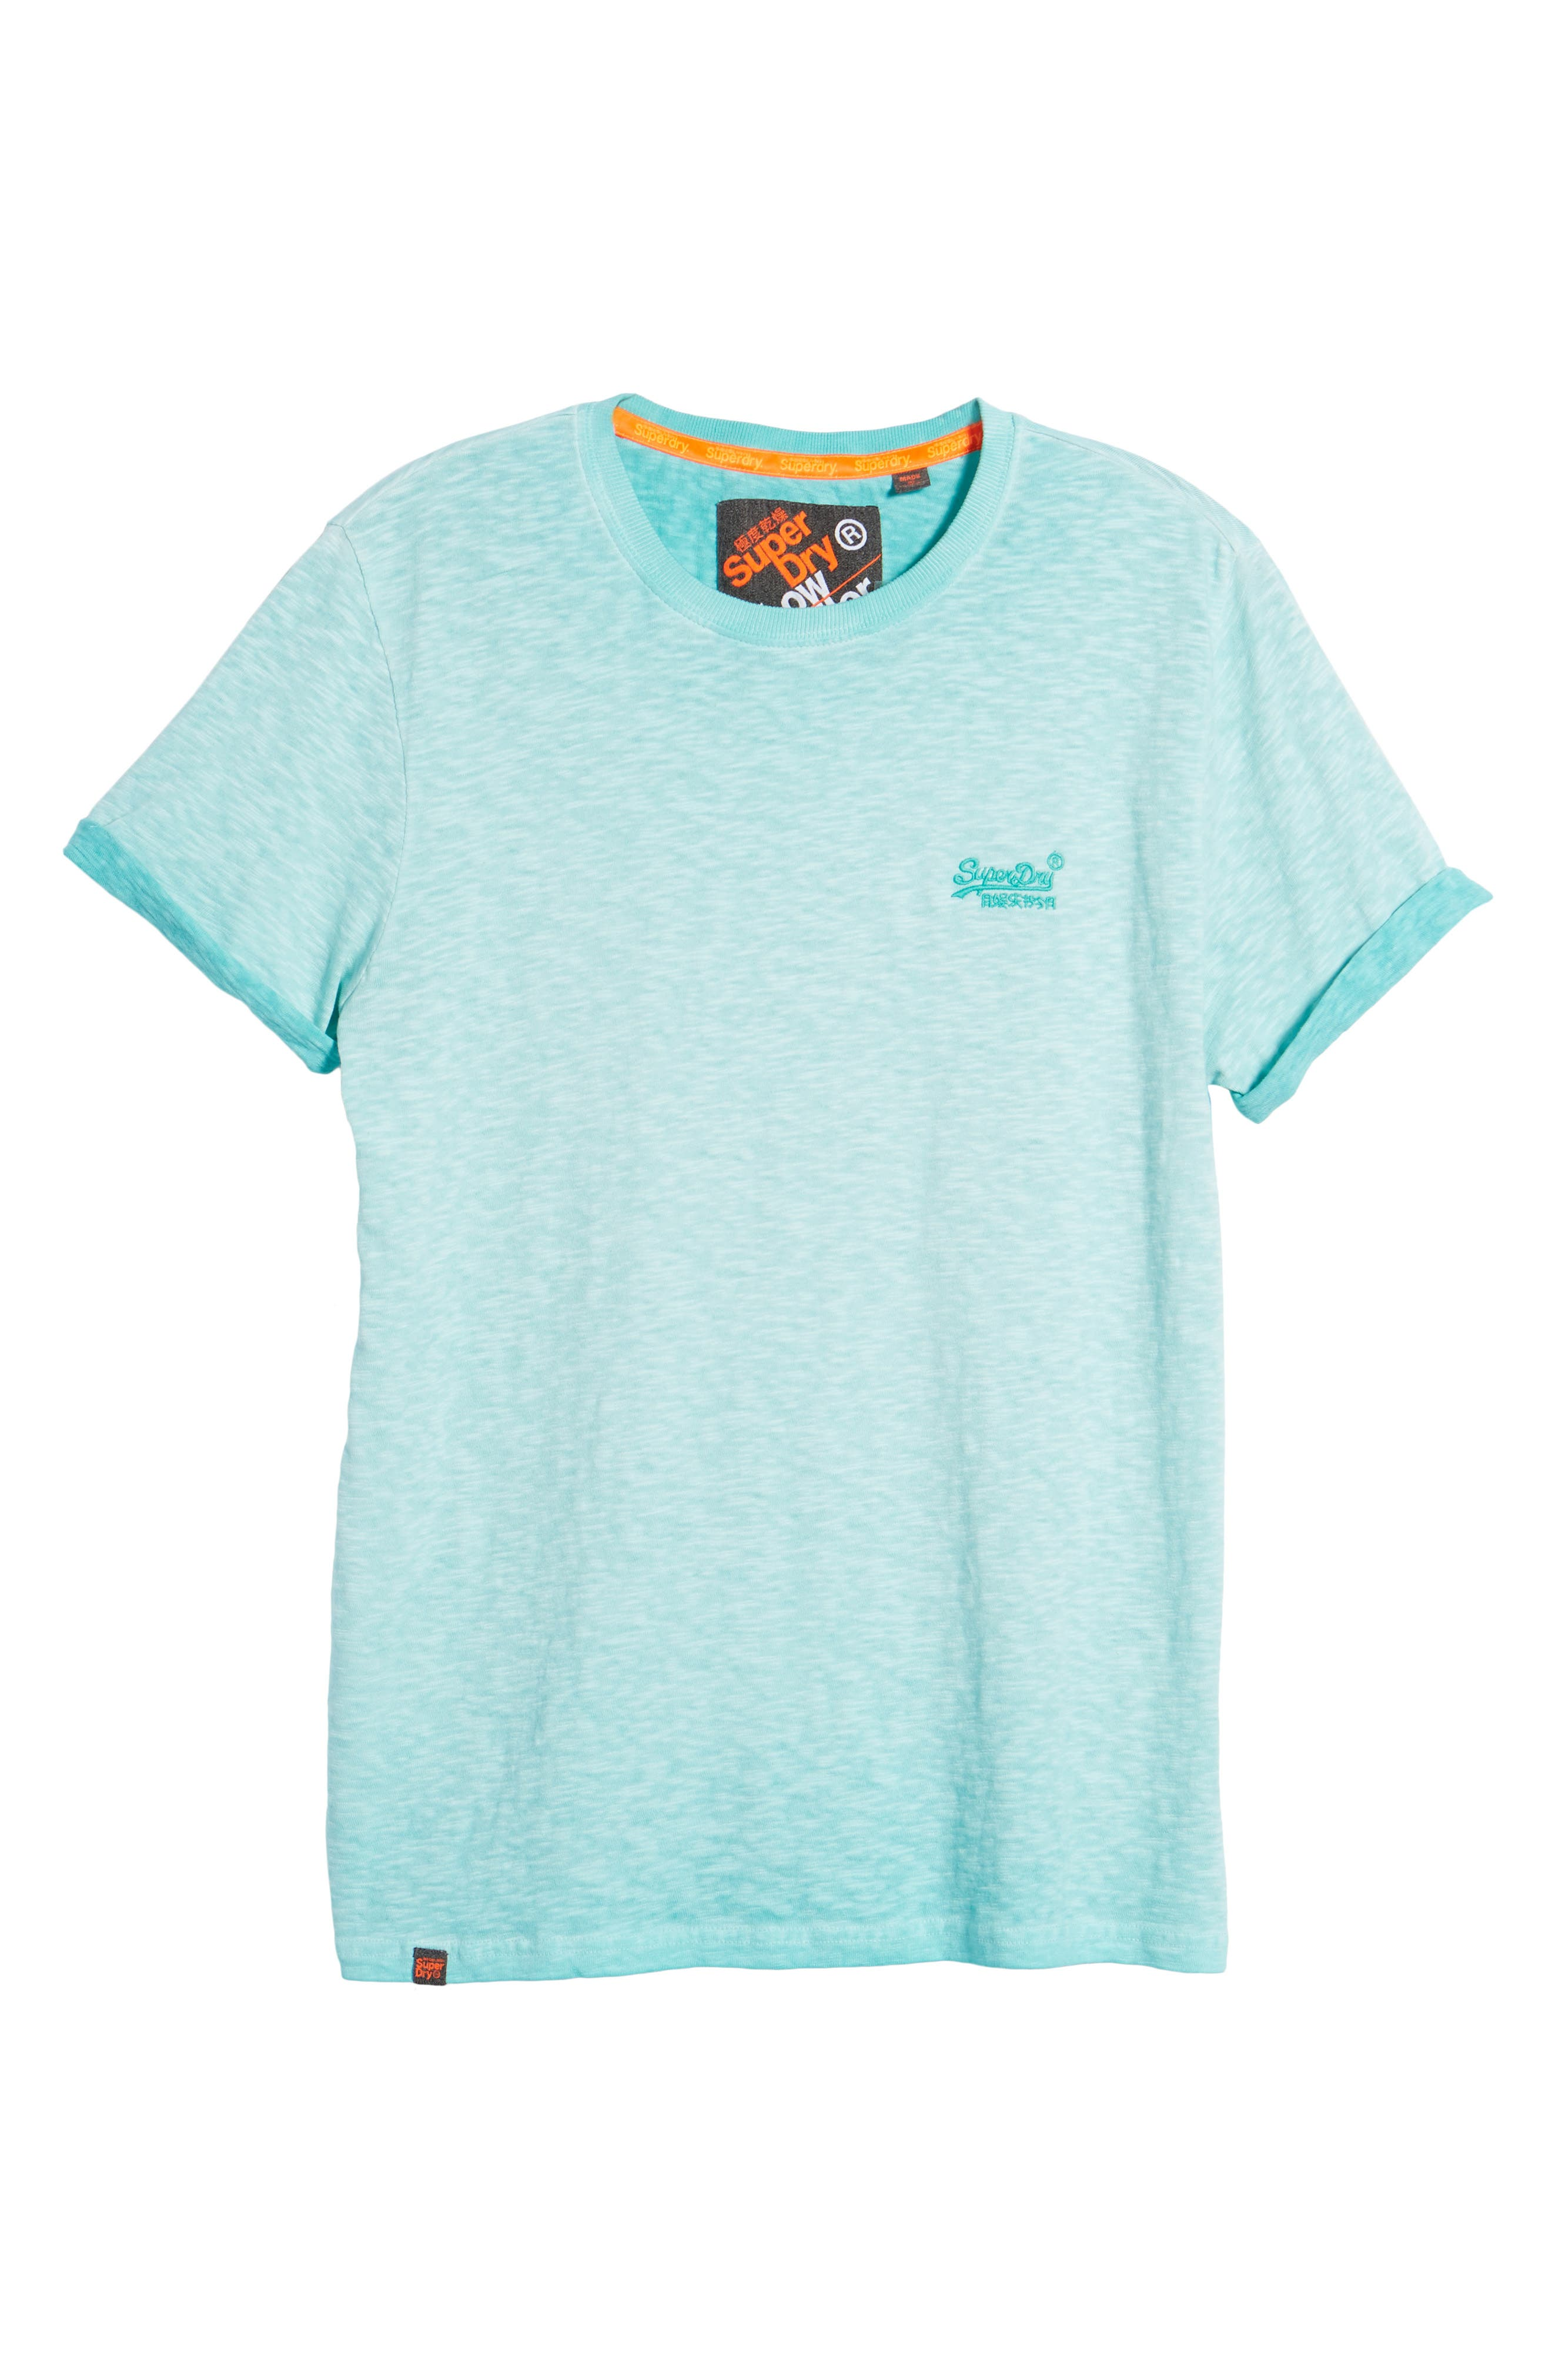 Orange Label Low Roller T-Shirt,                             Alternate thumbnail 28, color,